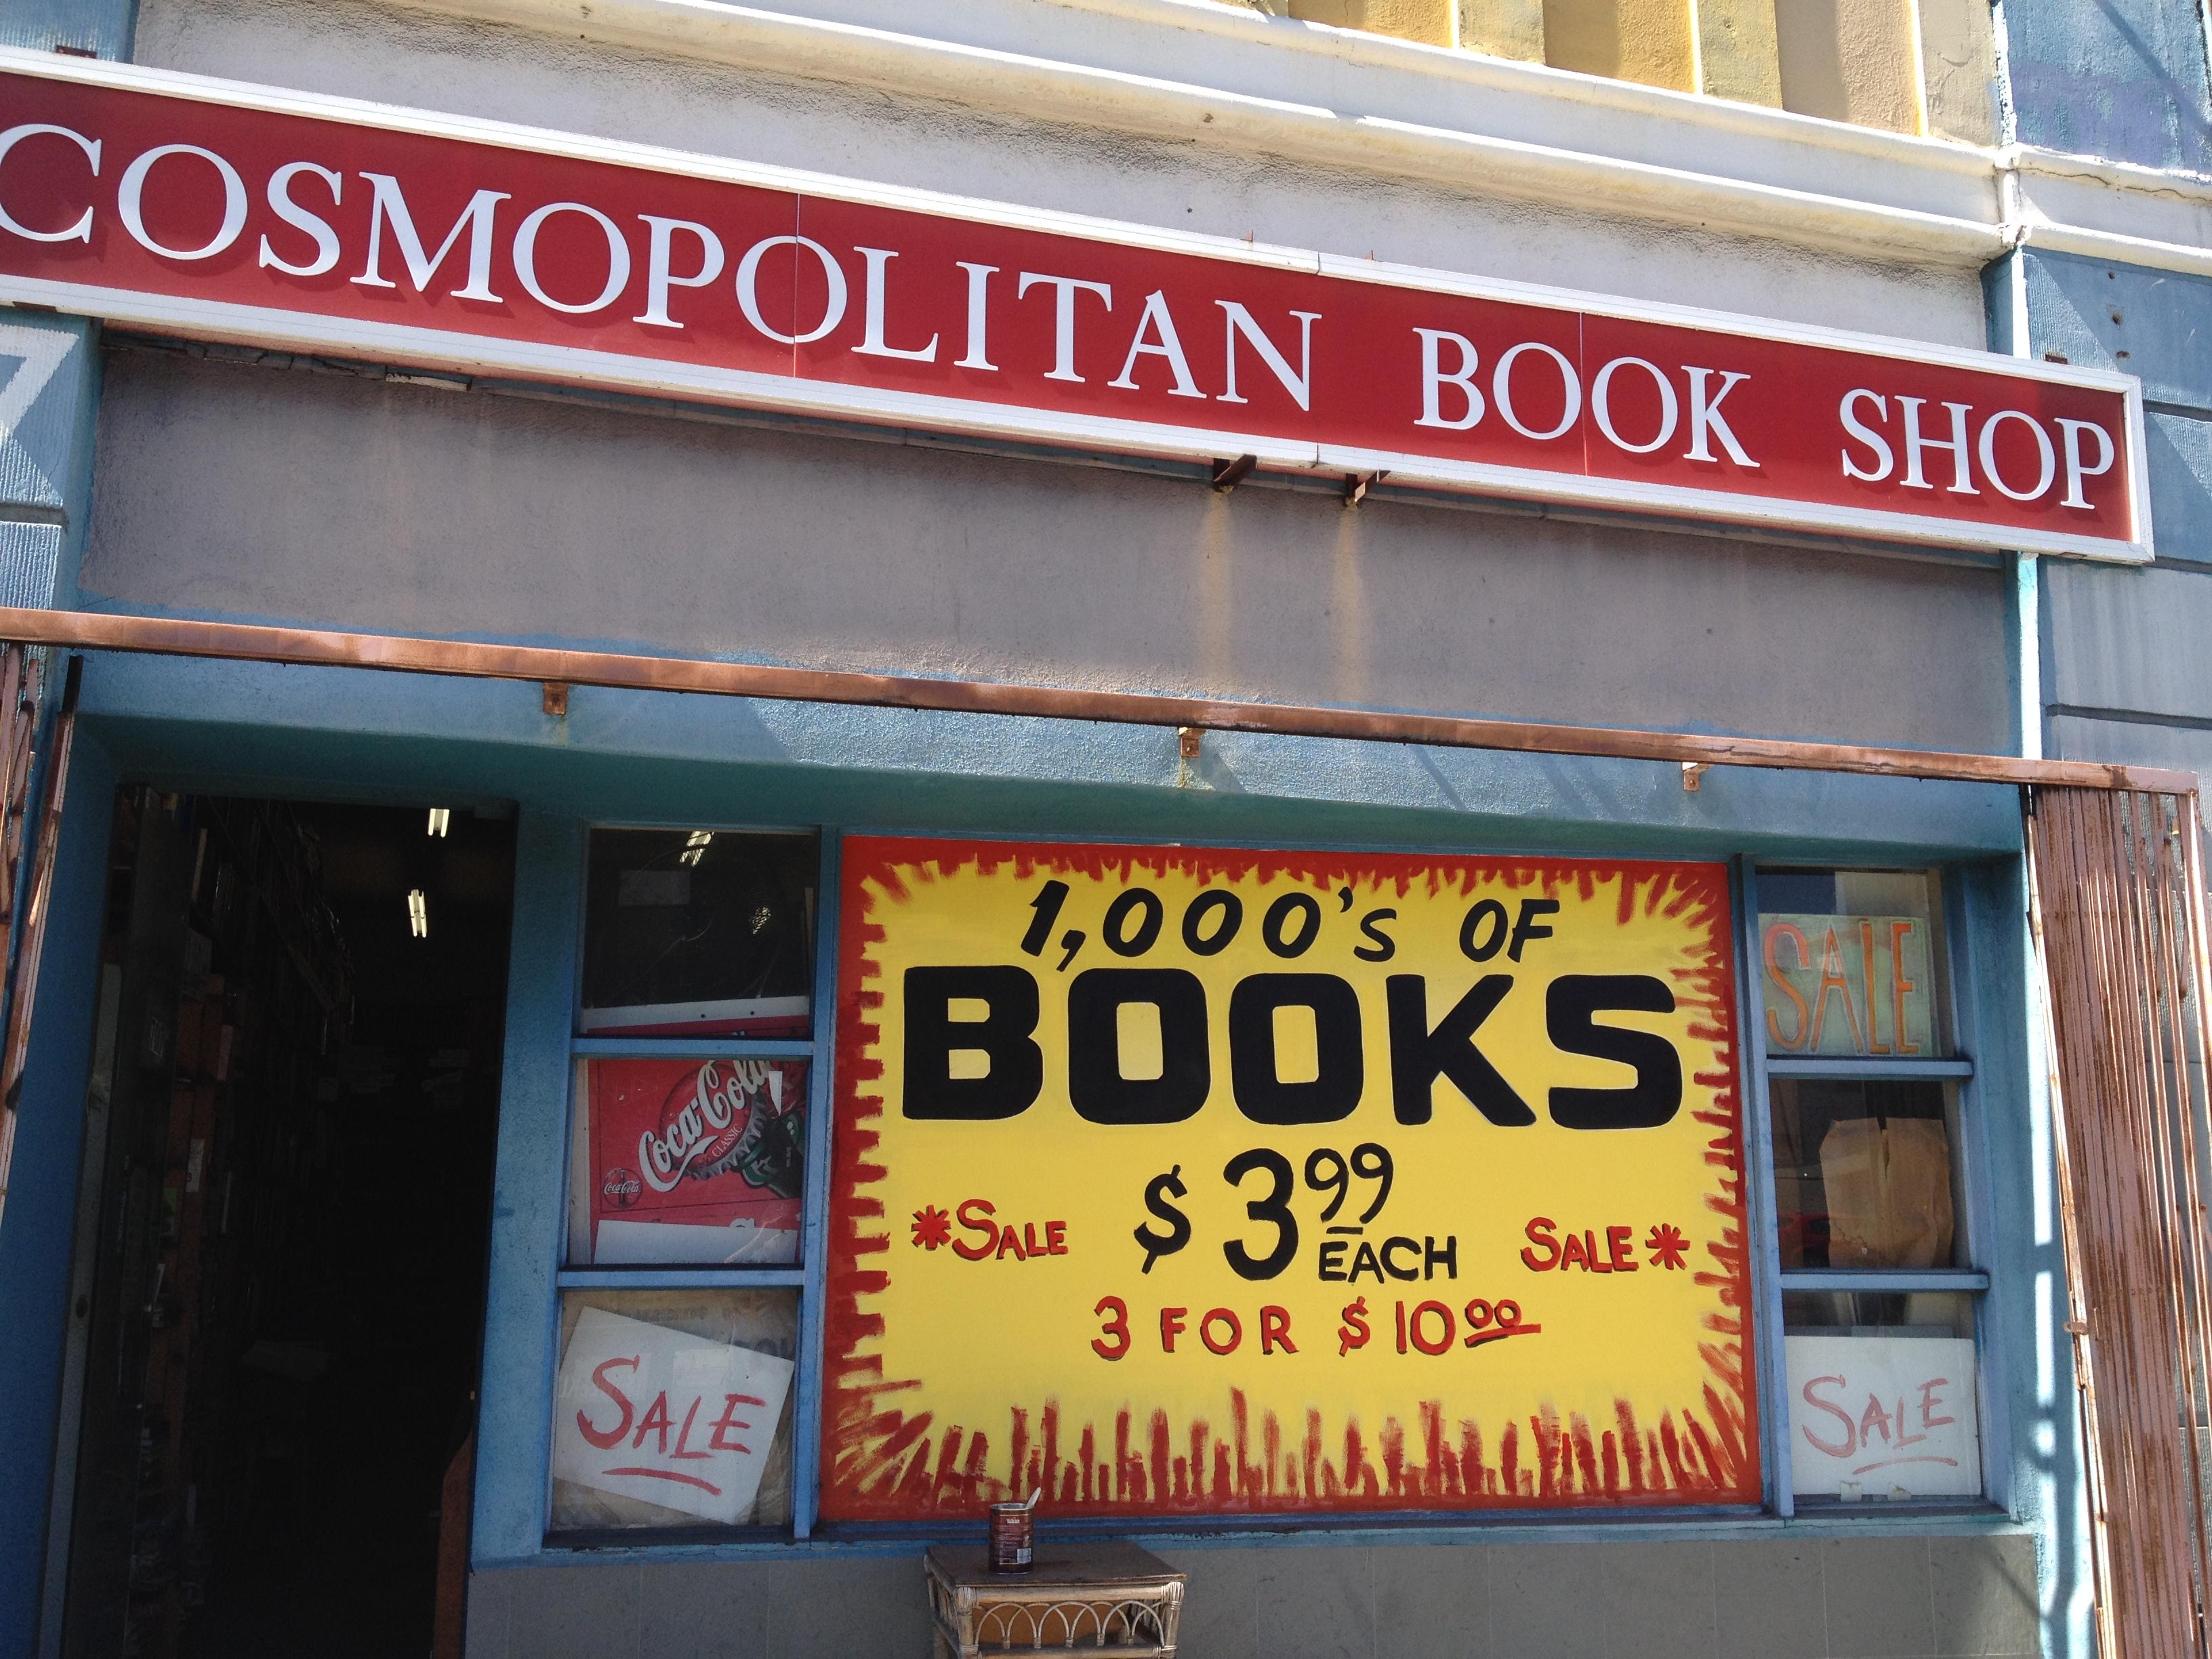 Cosmopolitan Book Shop